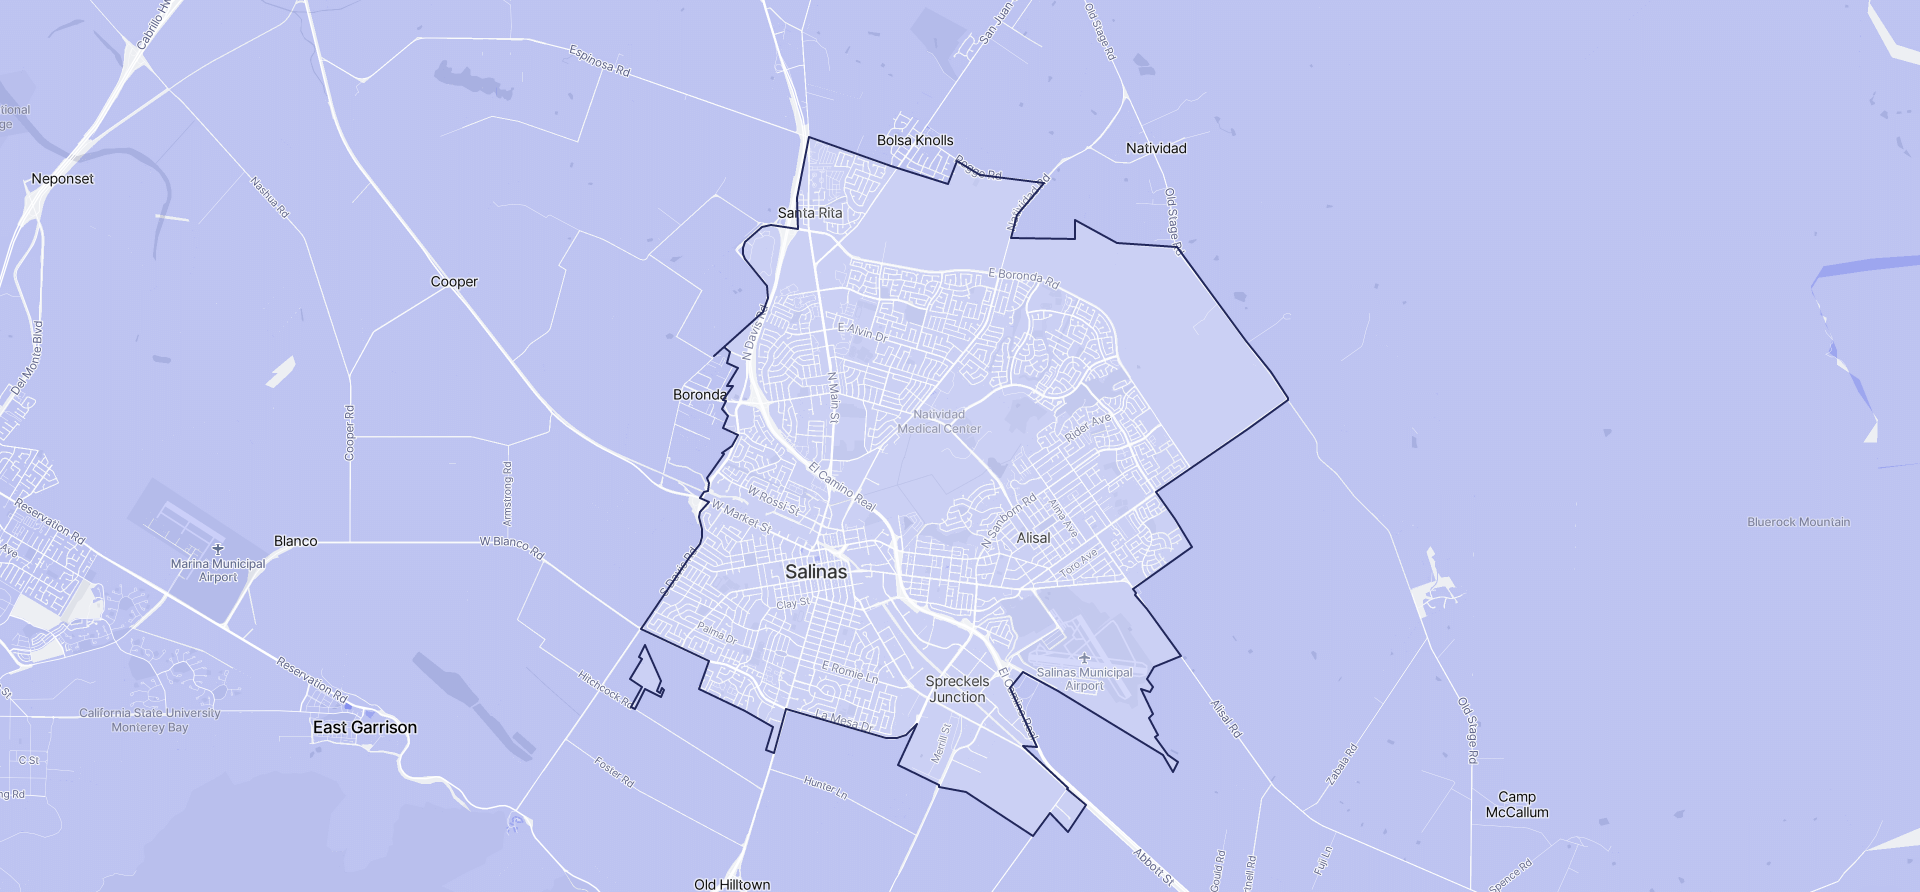 Image of Salinas boundaries on a map.